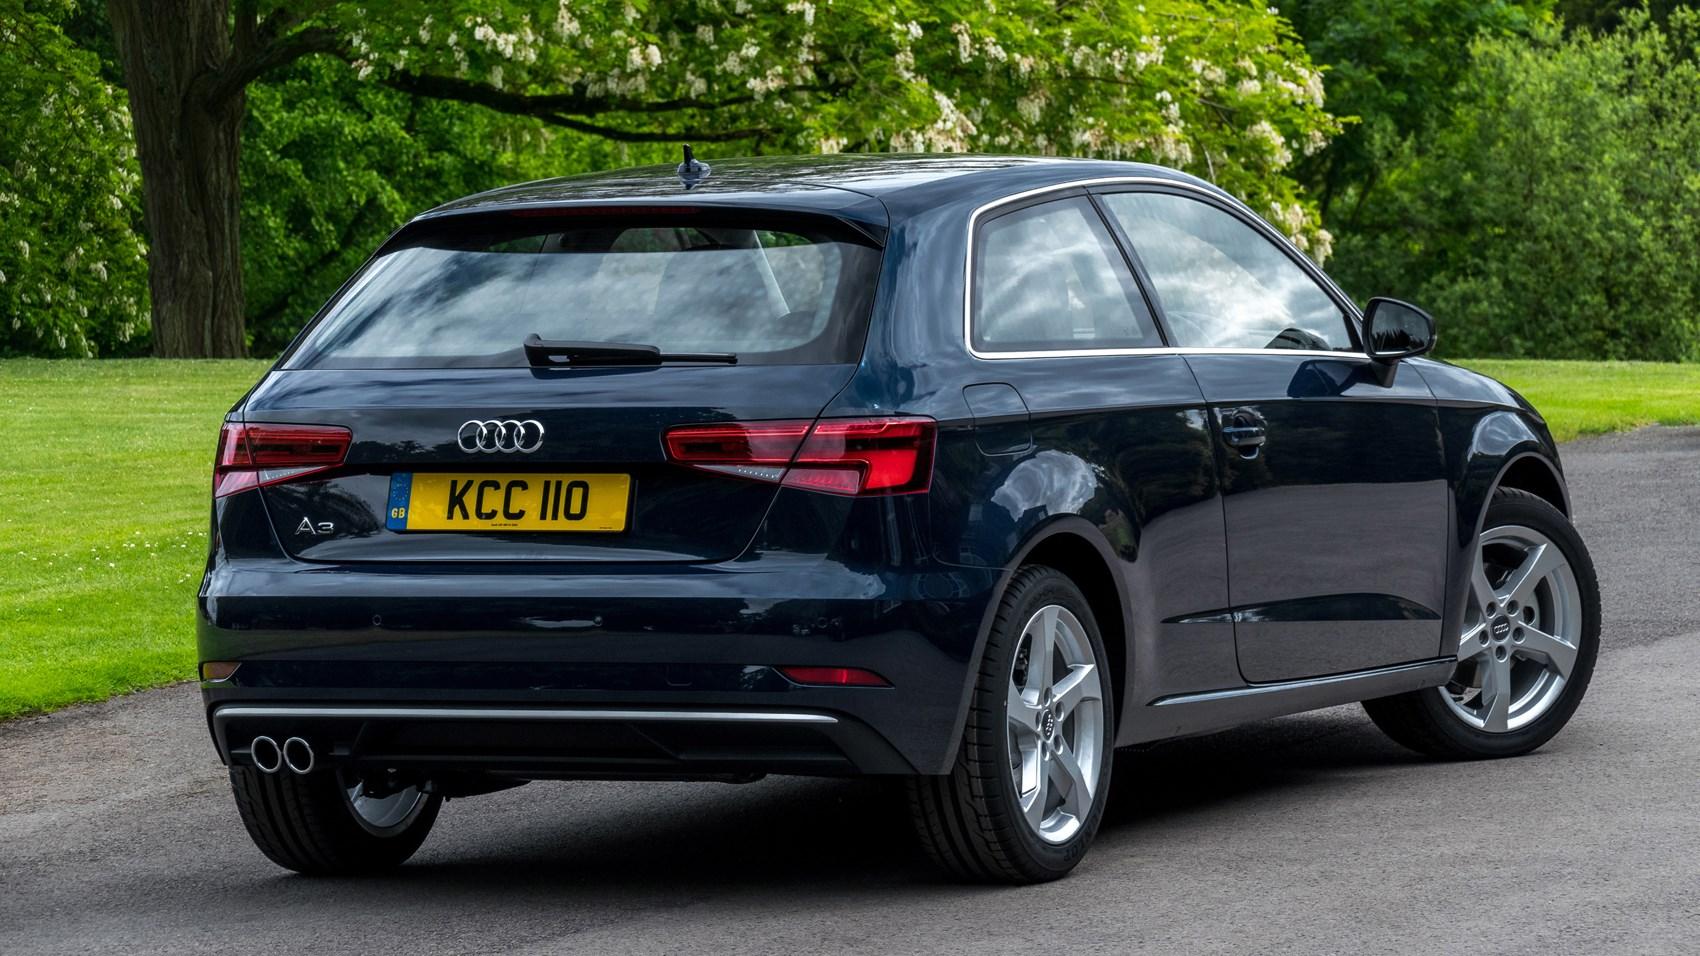 Audi A3 (2016) 1.4 TFSI S Line review   CAR Magazine